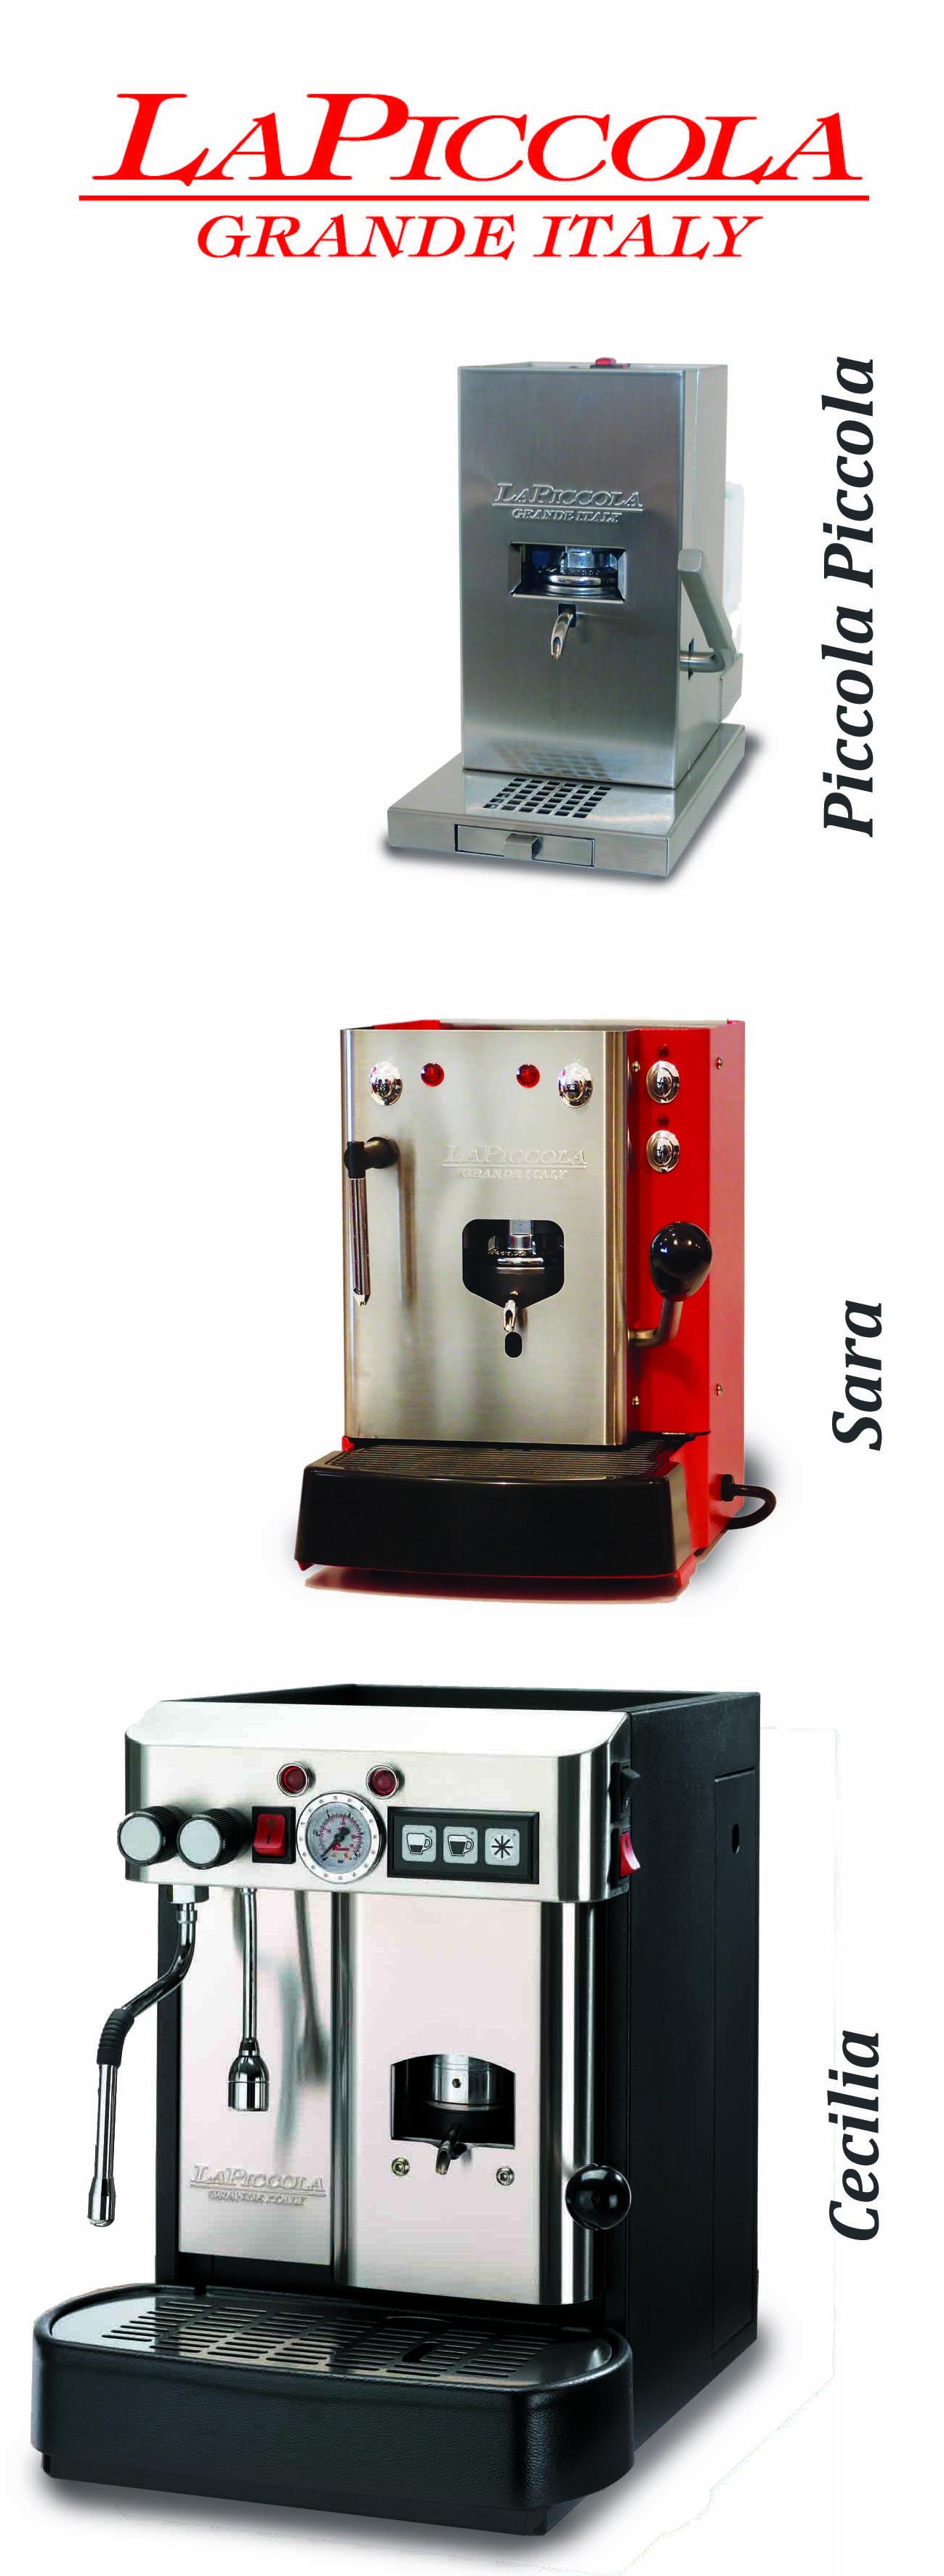 La Piccola ese coffee pod machine range